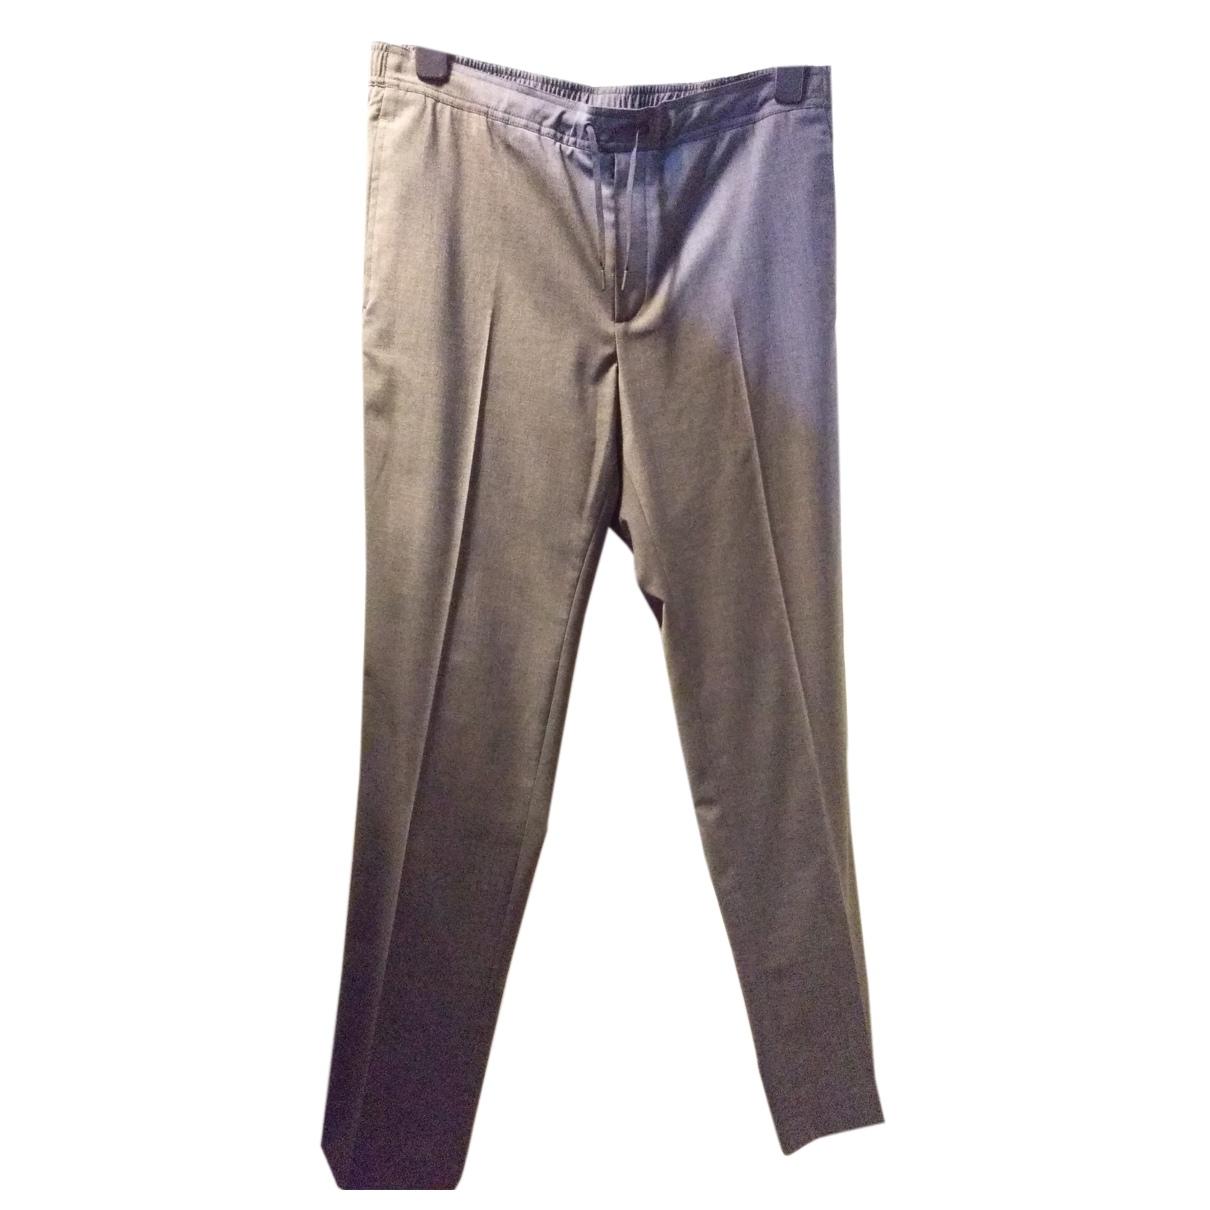 Sandro Fall Winter 2019 Grey Wool Trousers for Men 44 FR